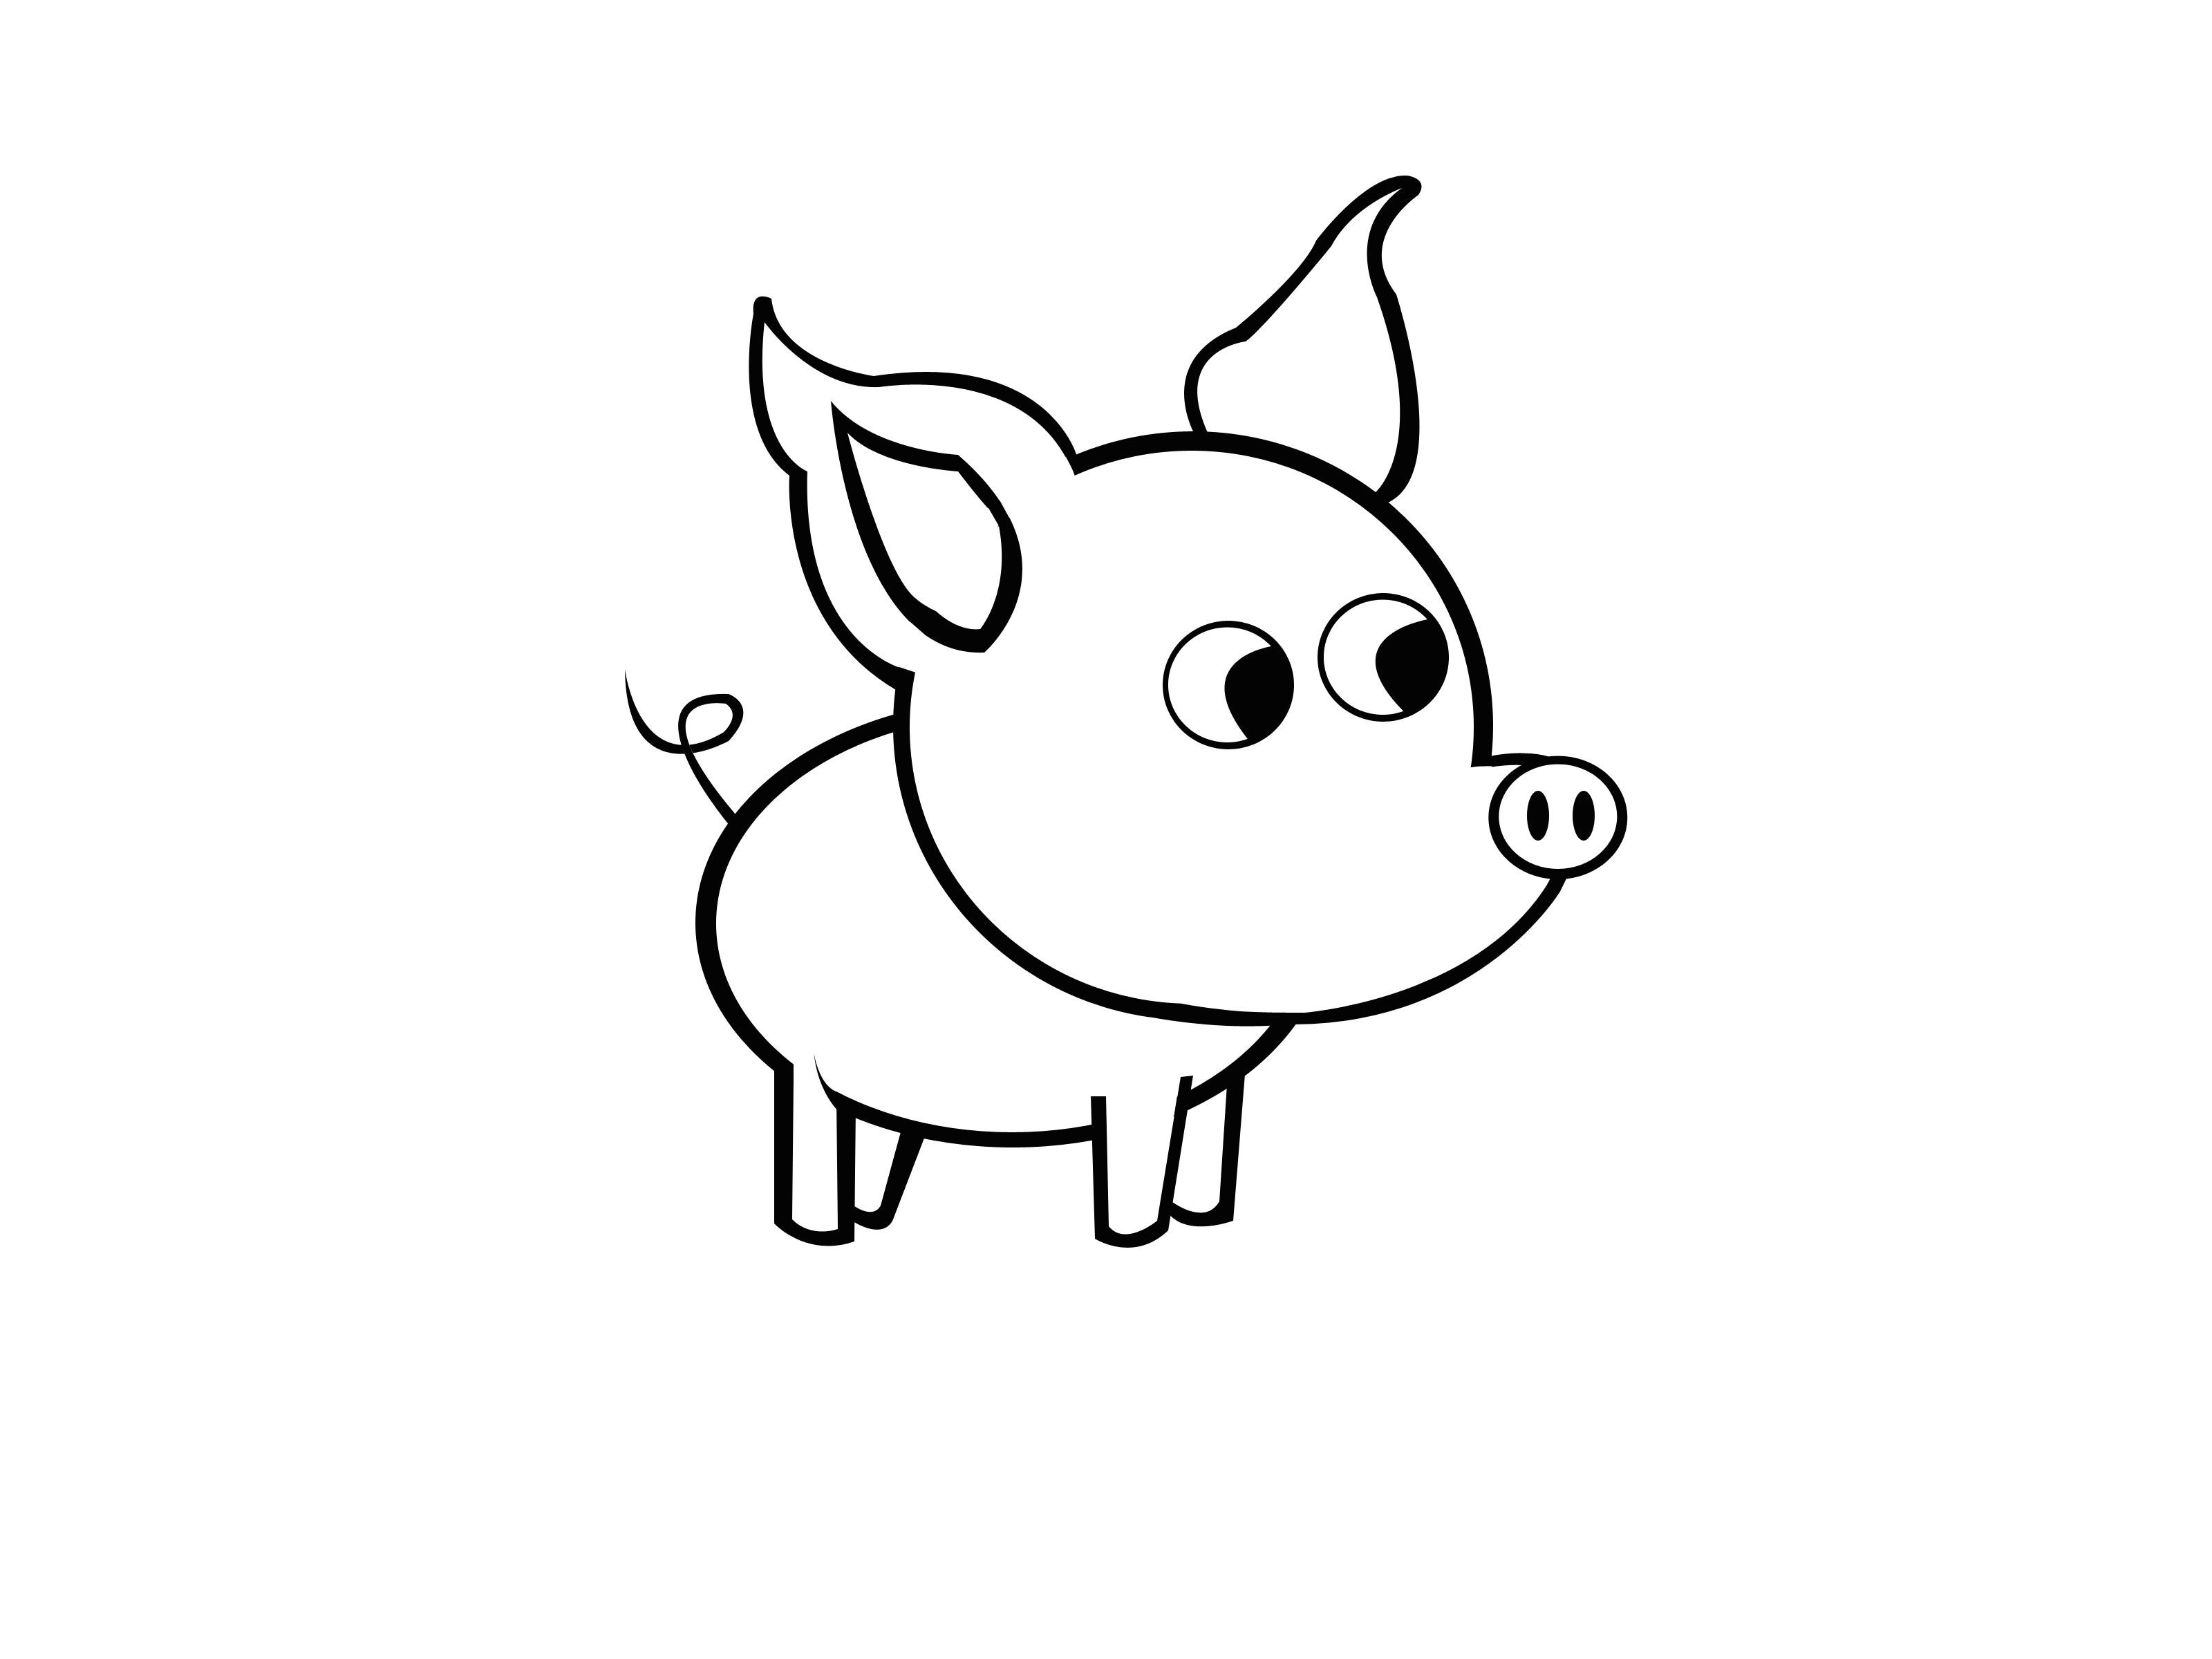 draw a simple pig step 9 jpg